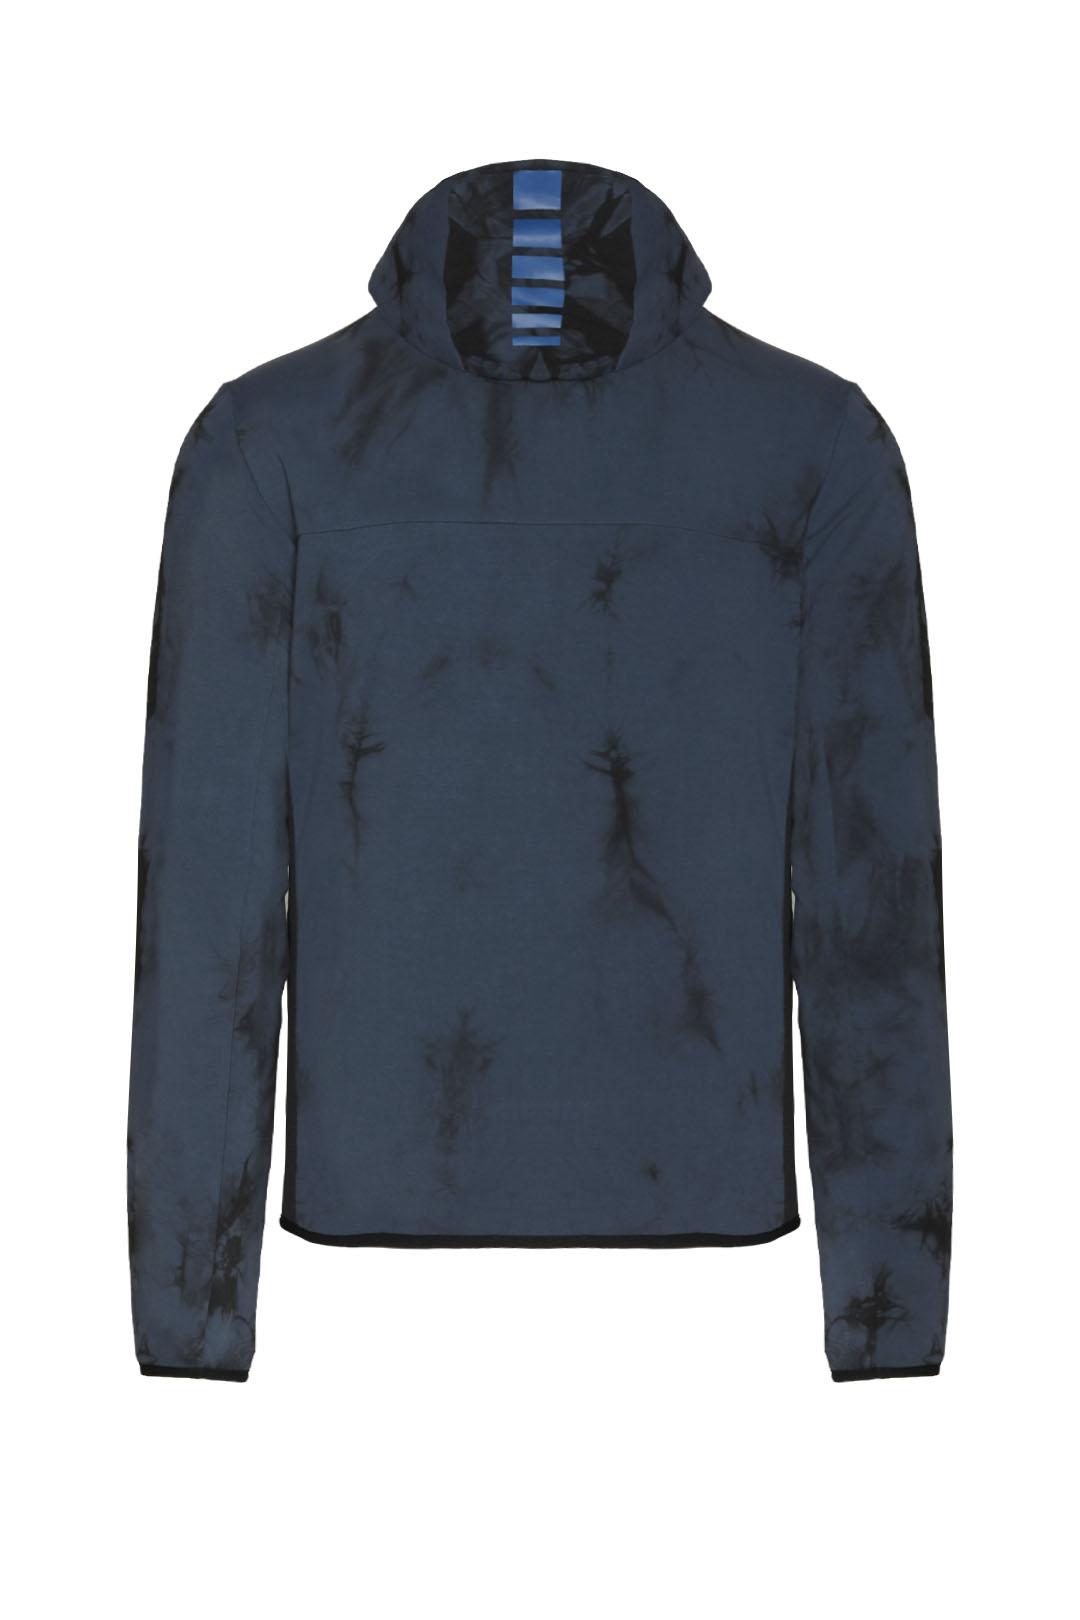 Sweatshirt élastique effet tie-dye       2